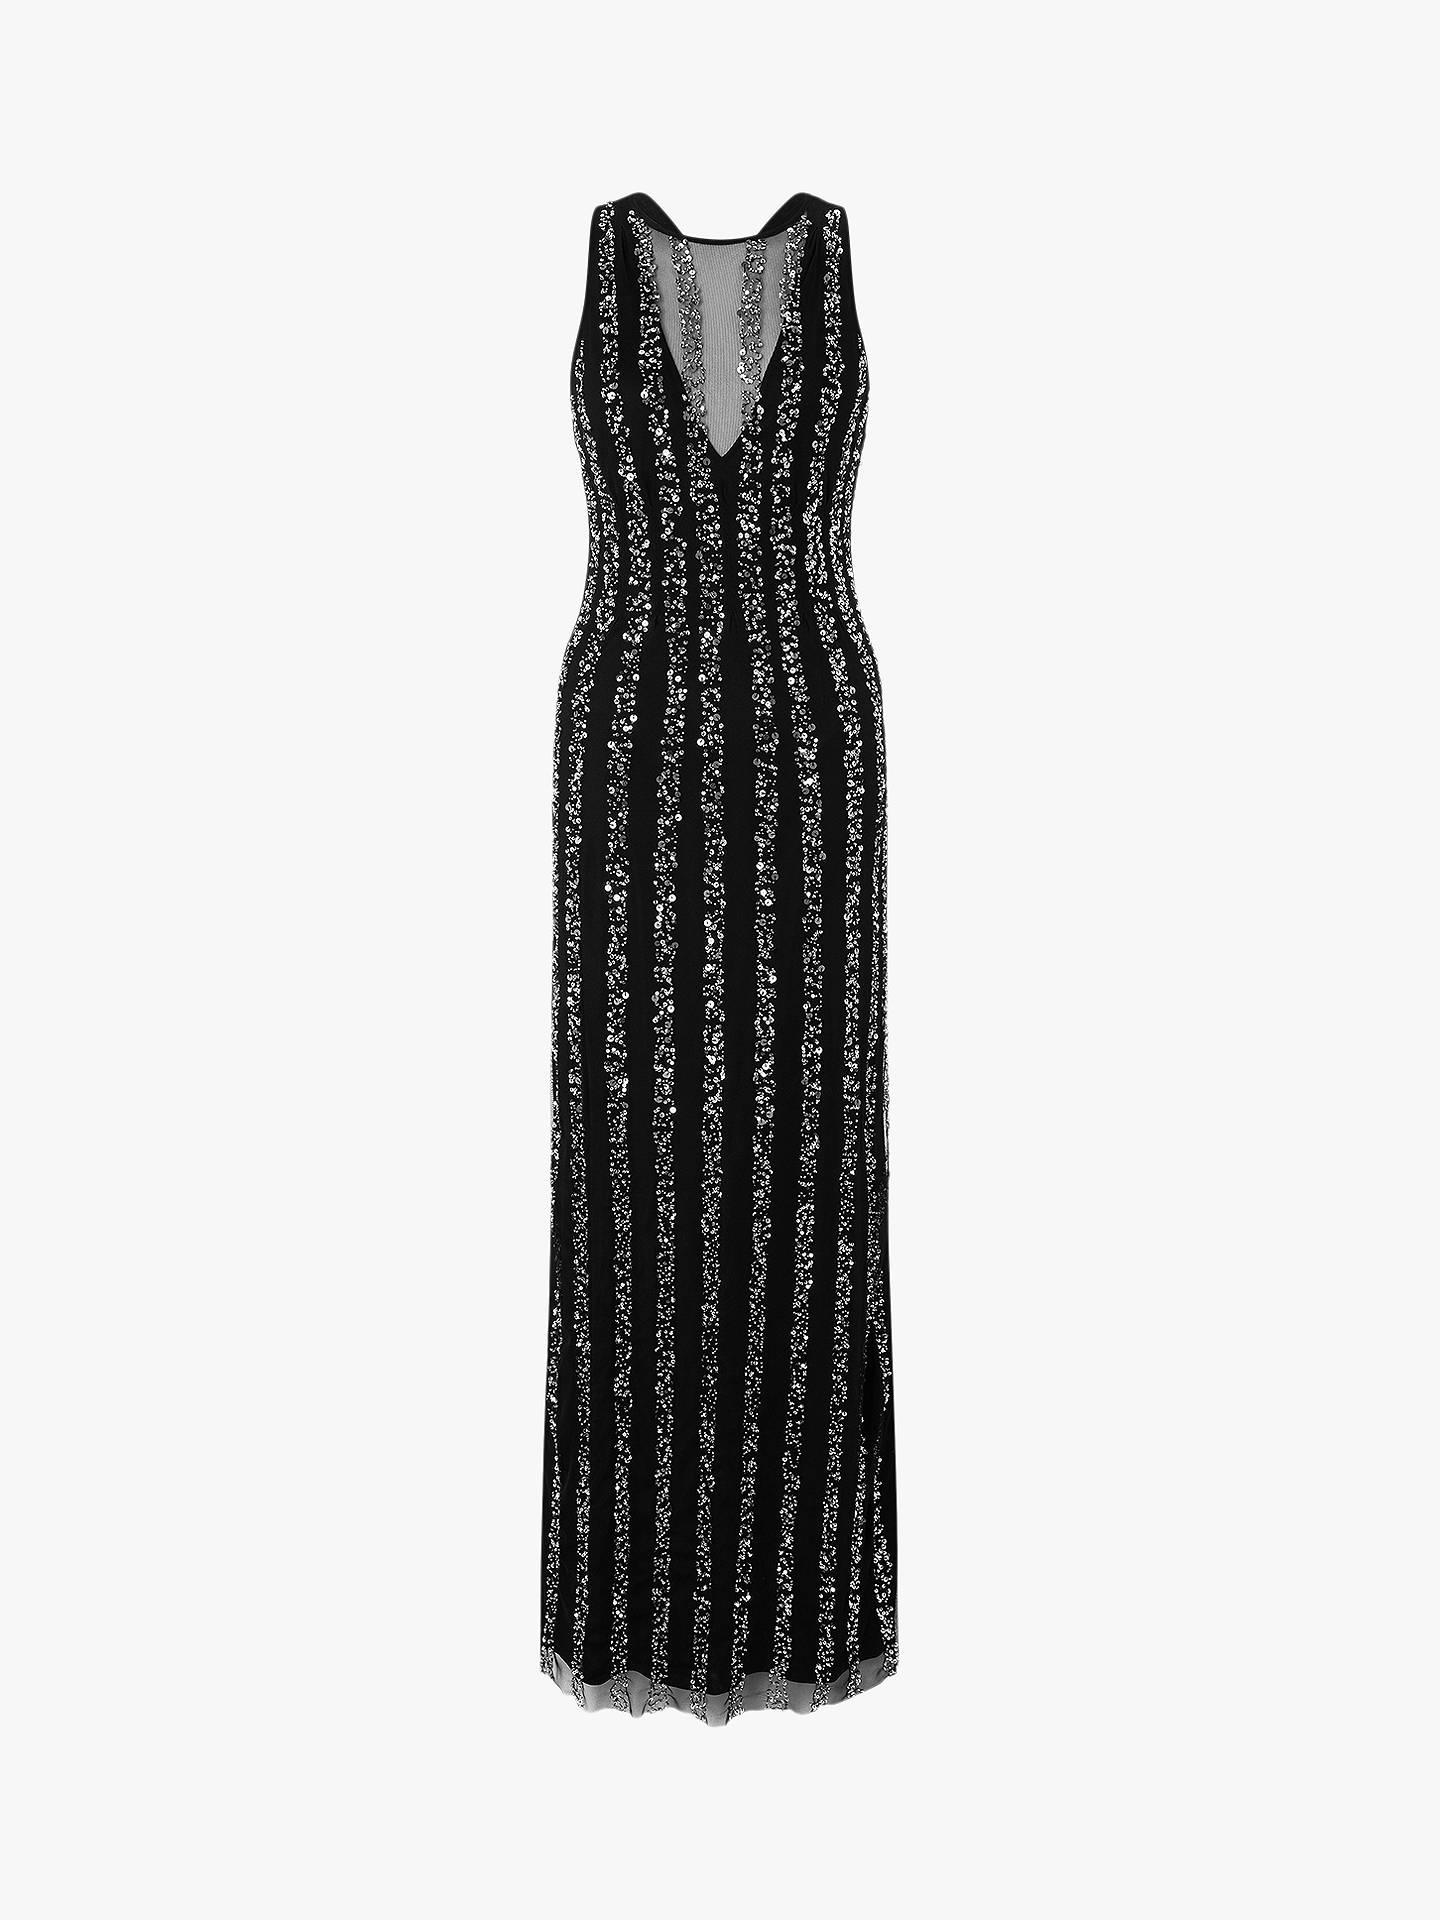 acc7fa858c Casual & Work dresses Sale | Monsoon - uk.monsoon.co.uk